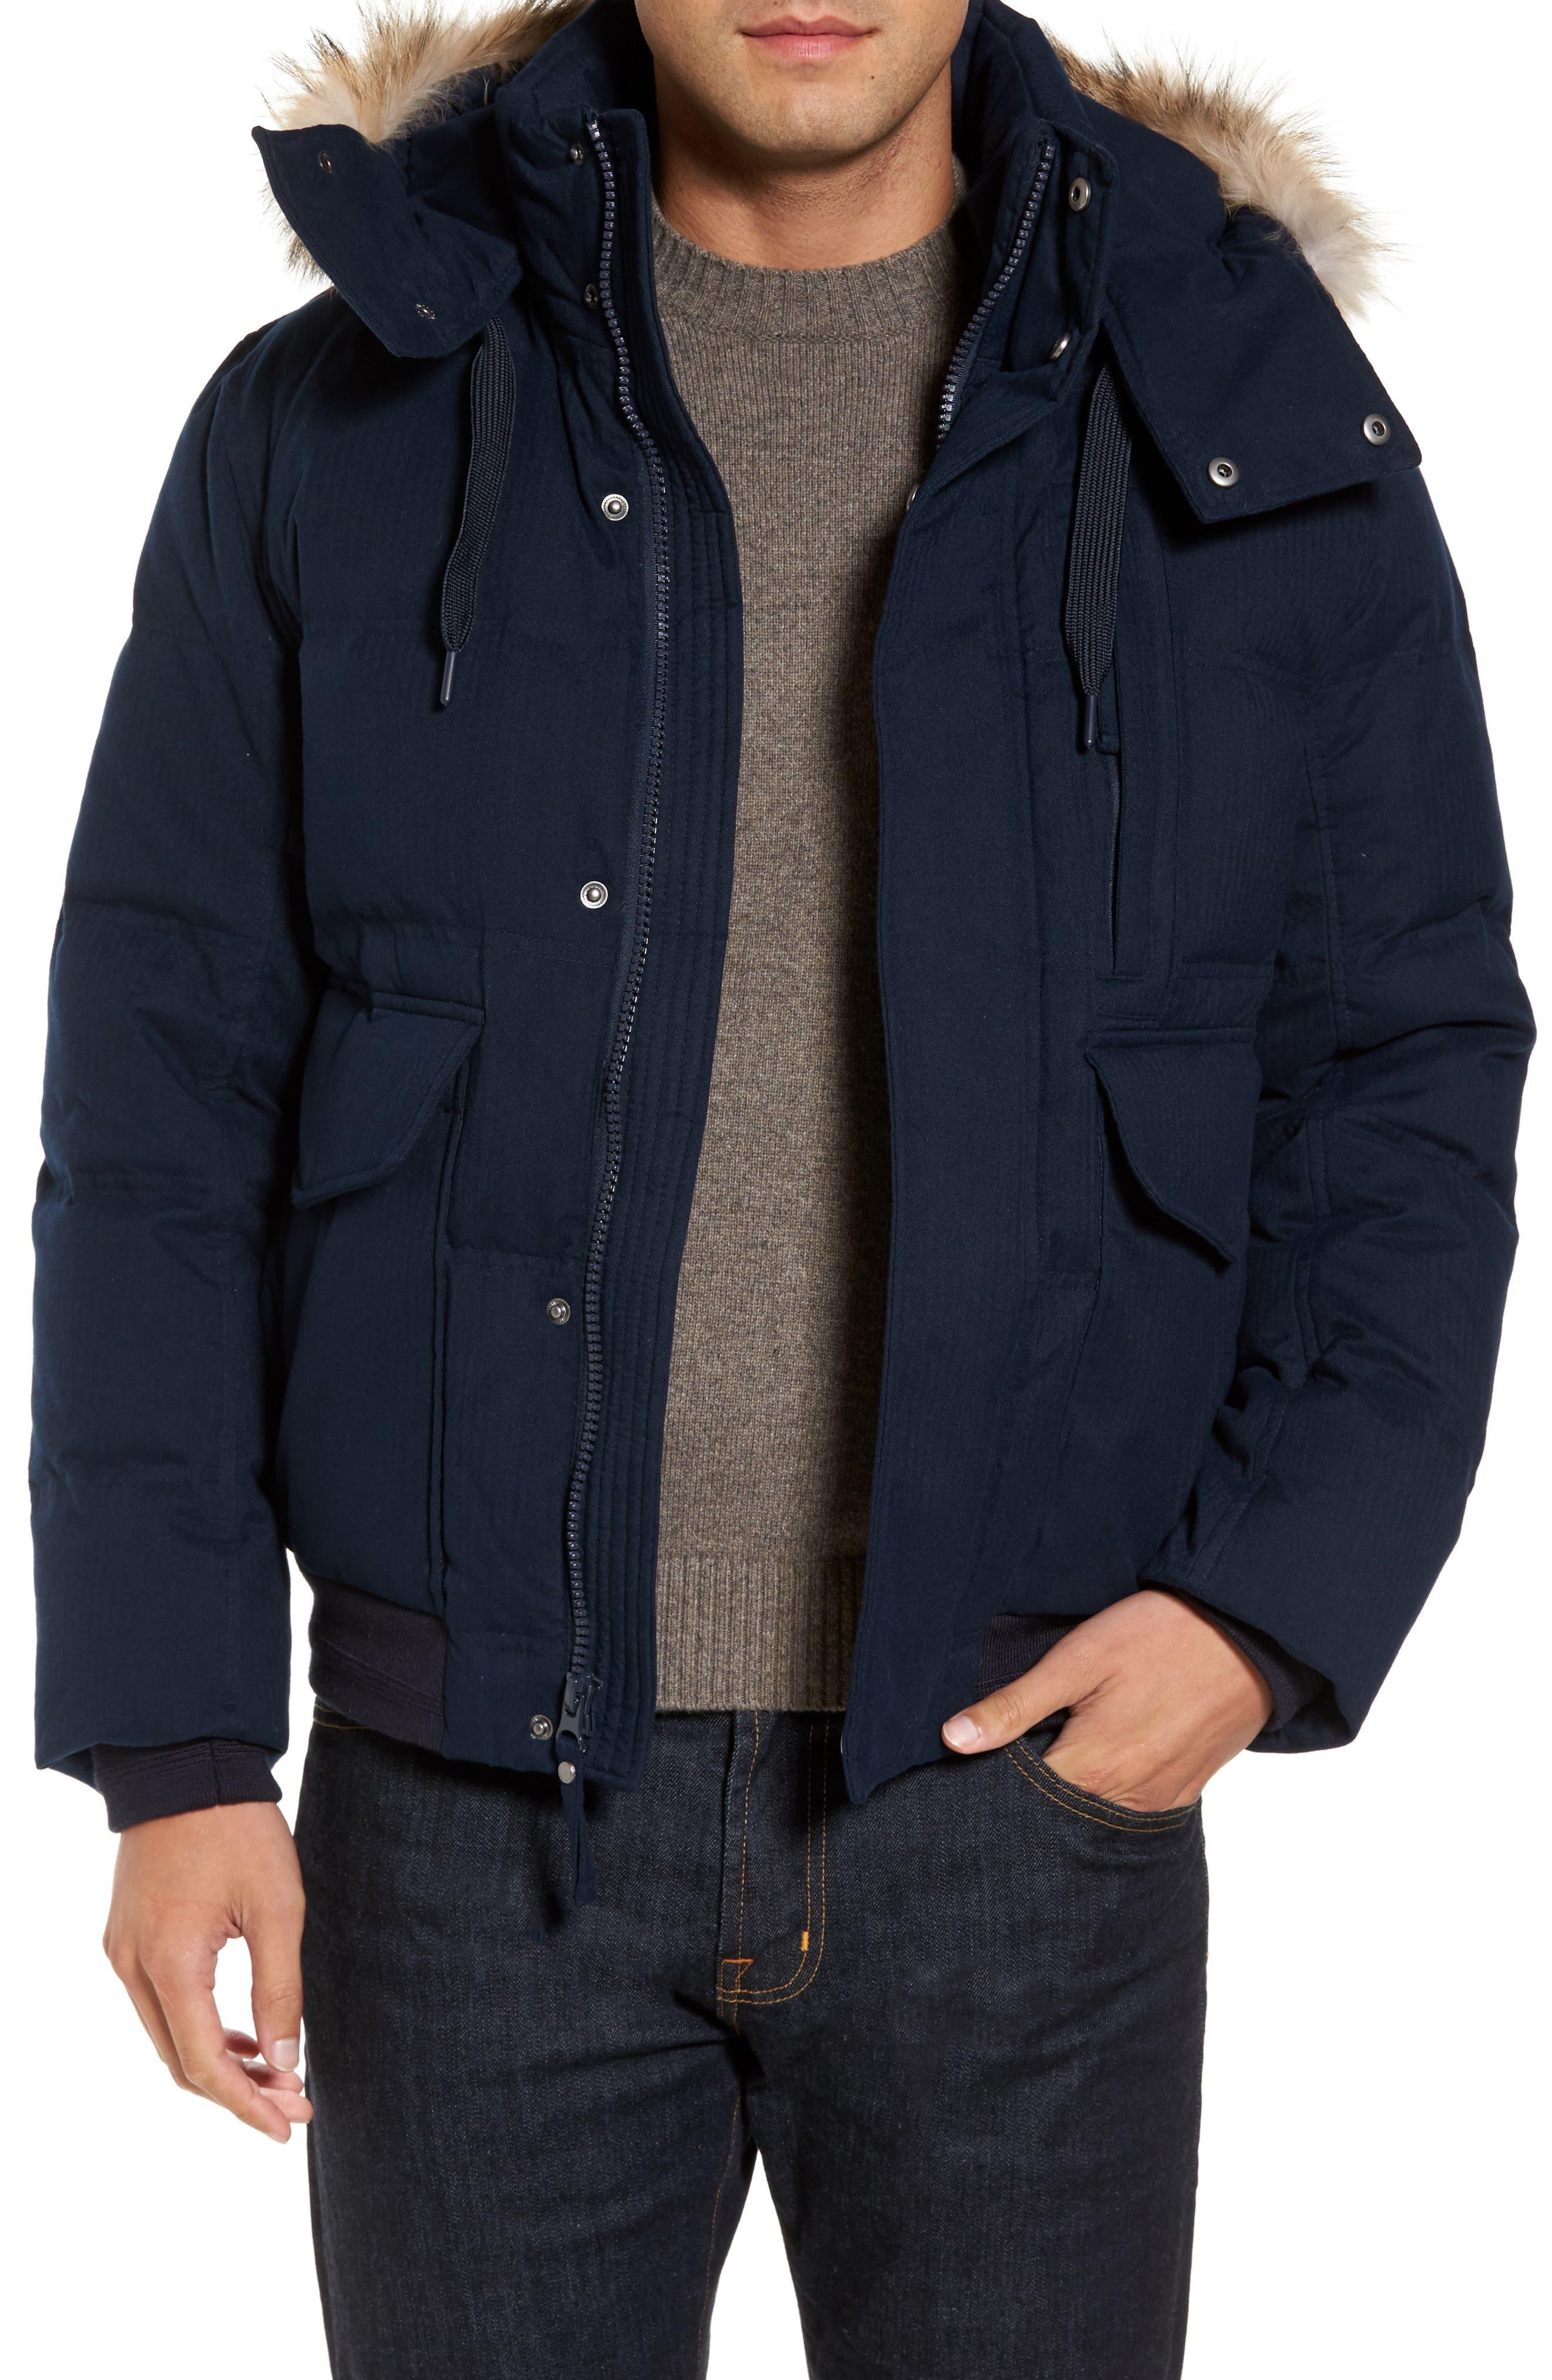 Marc New York Down Herringbone Jacket with Genuine Coyote Fur Trim